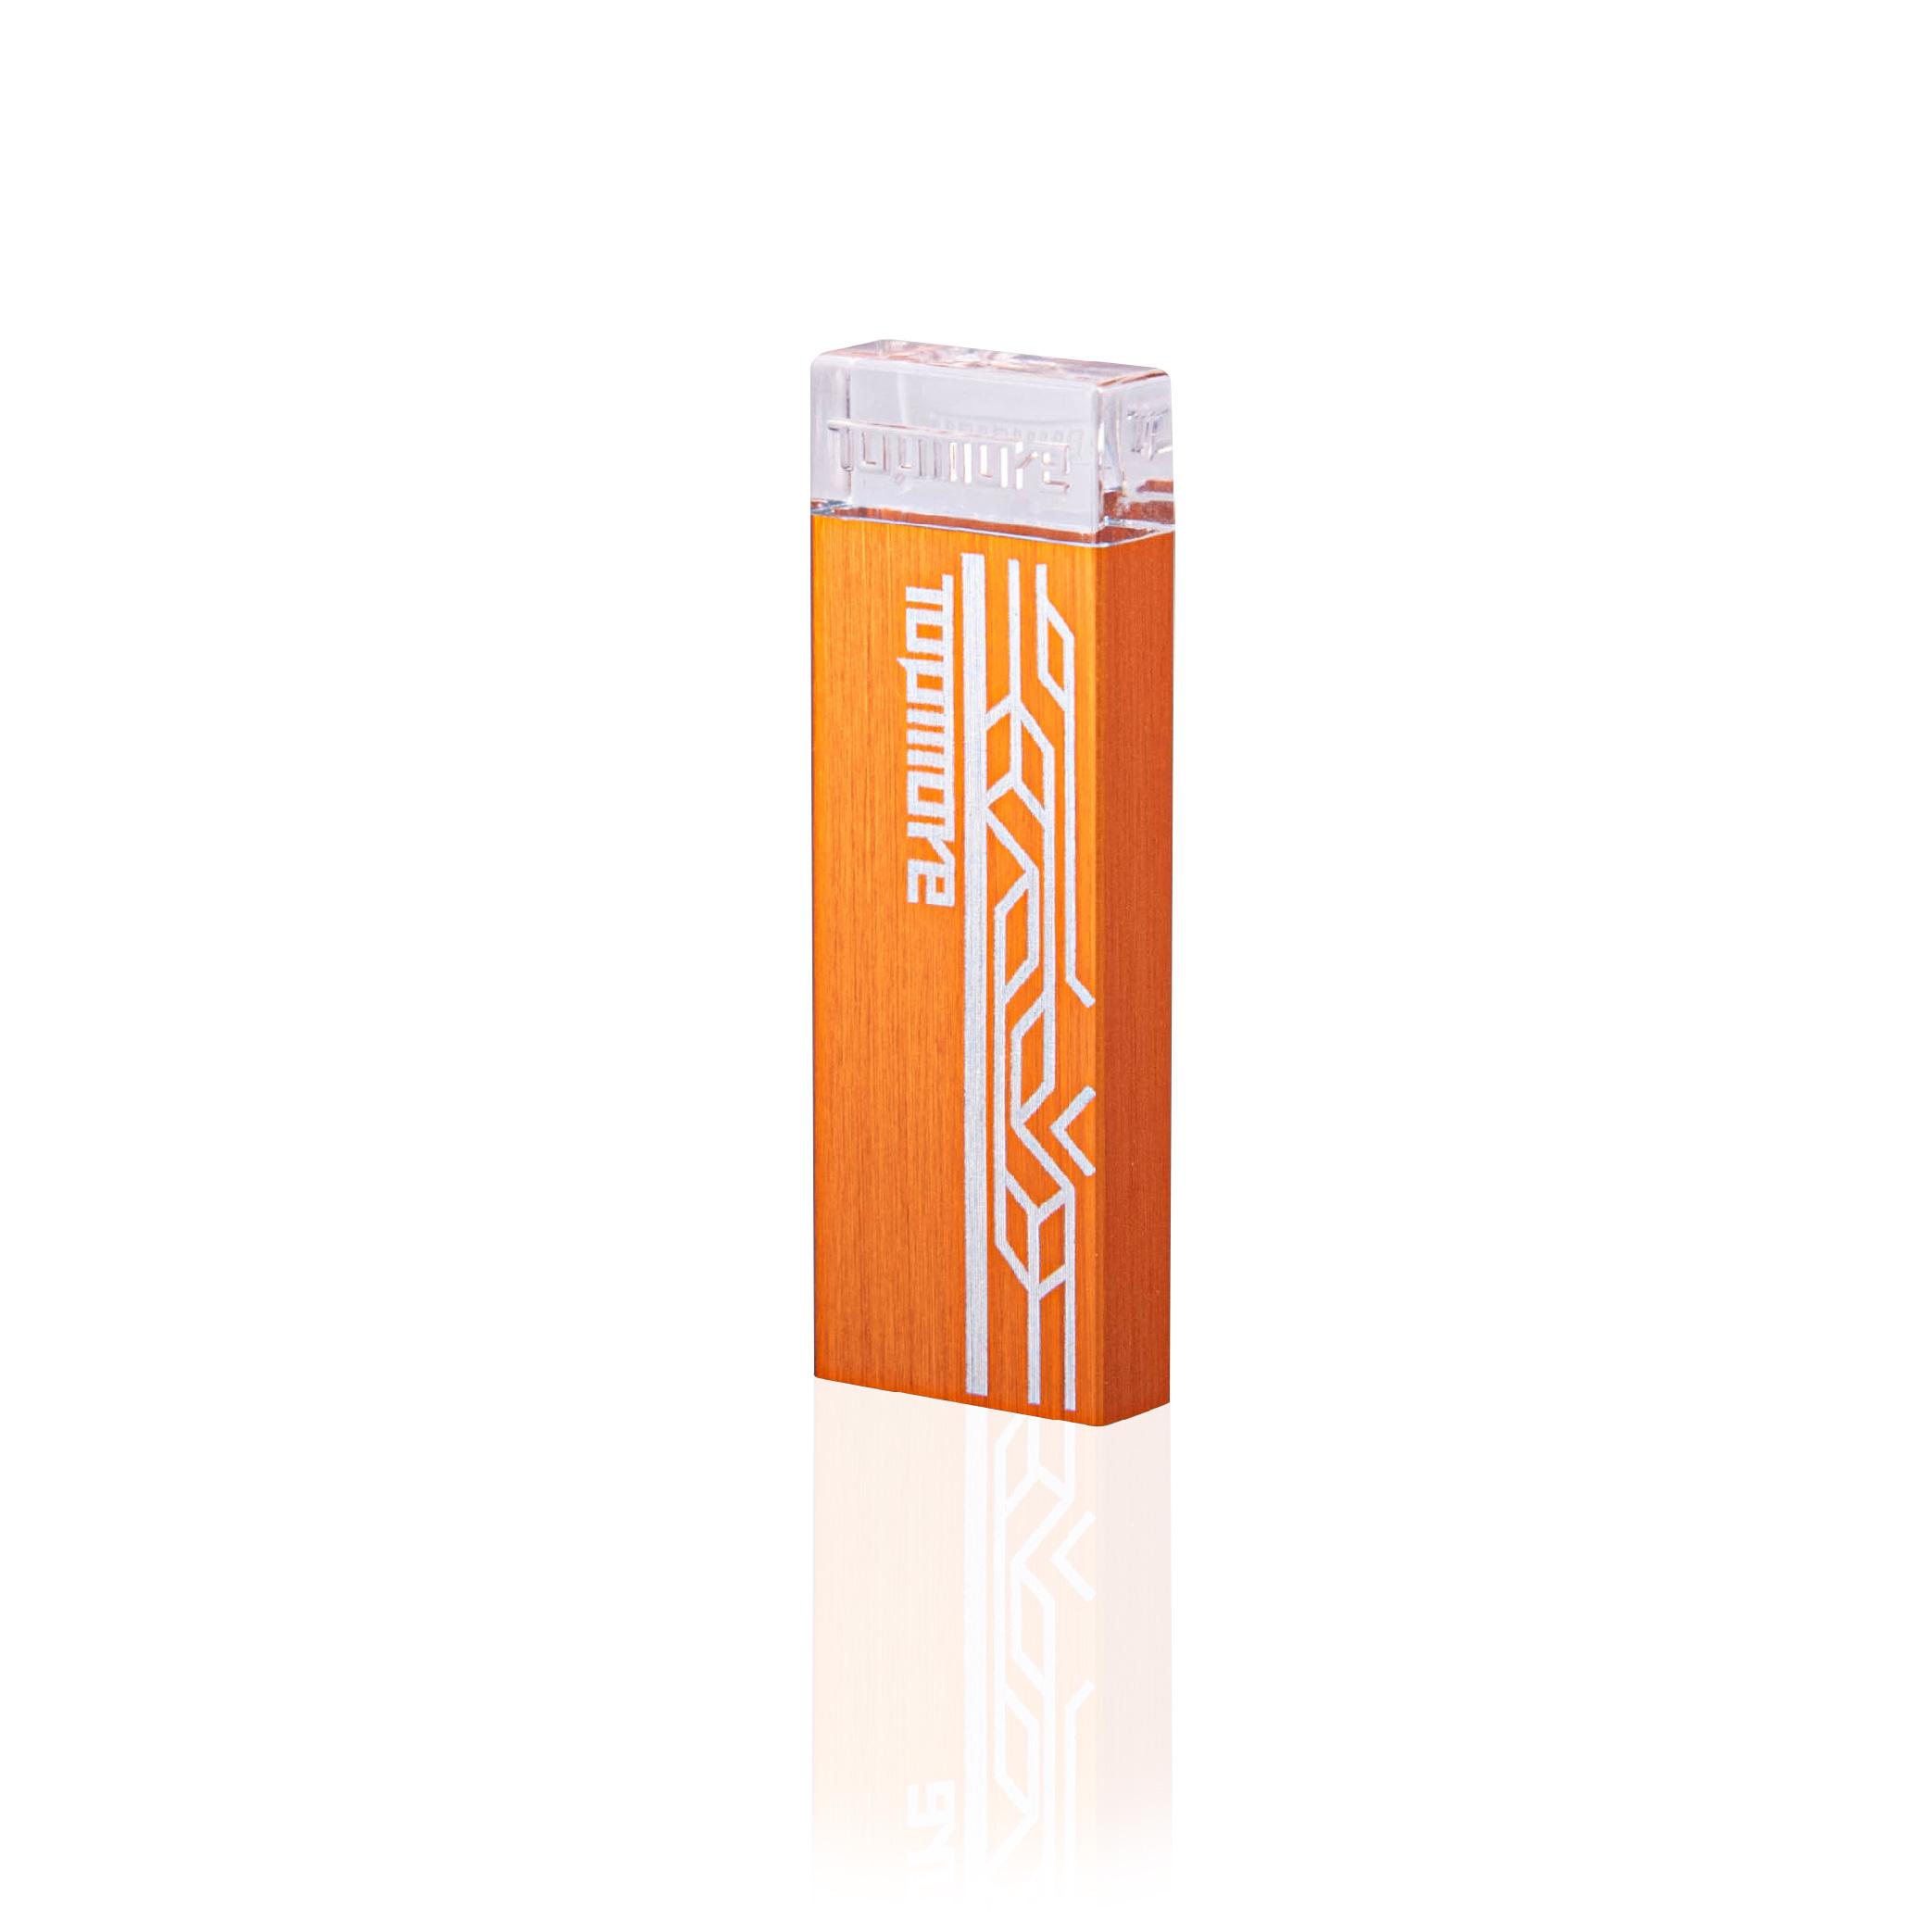 Topmore 達墨系列AI發光隨身碟 USB3.0 128GB-橘色